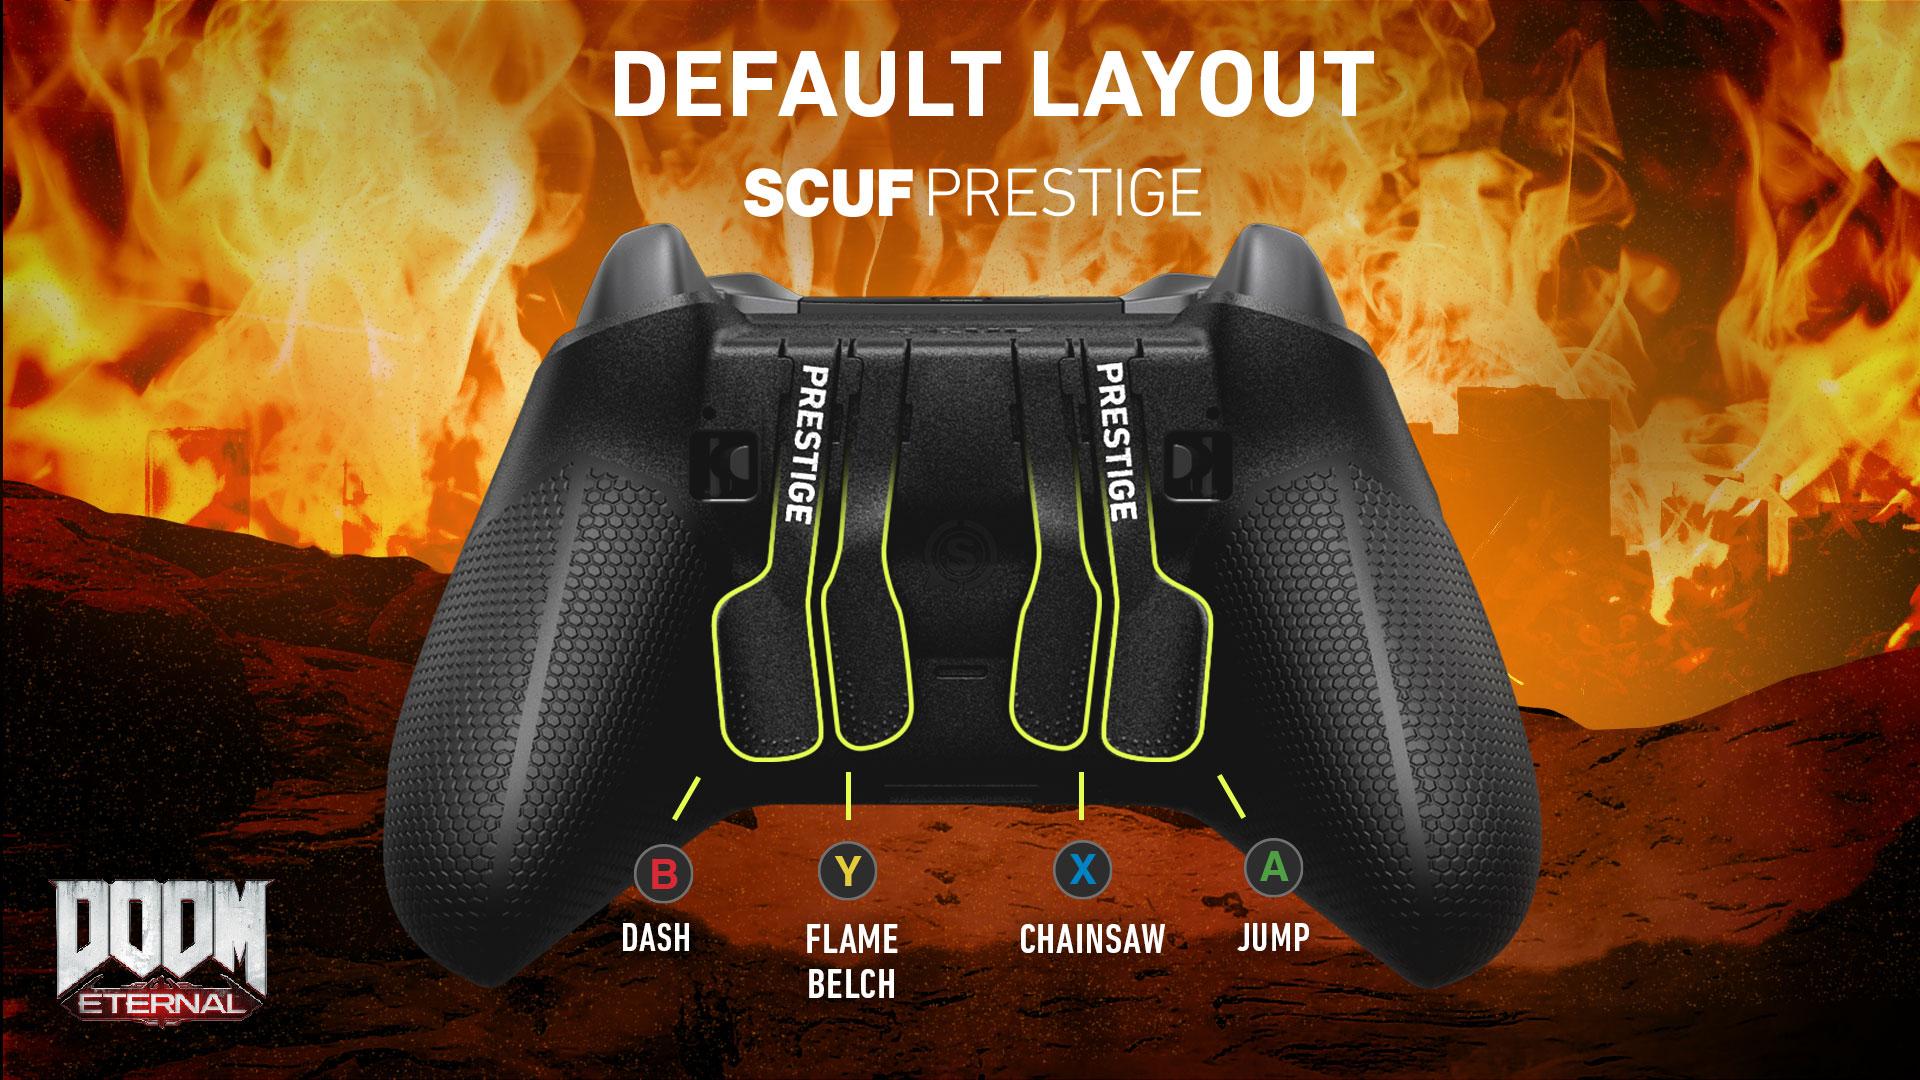 SCUF Prestige Doom Eternal Xbox One Controller Setup